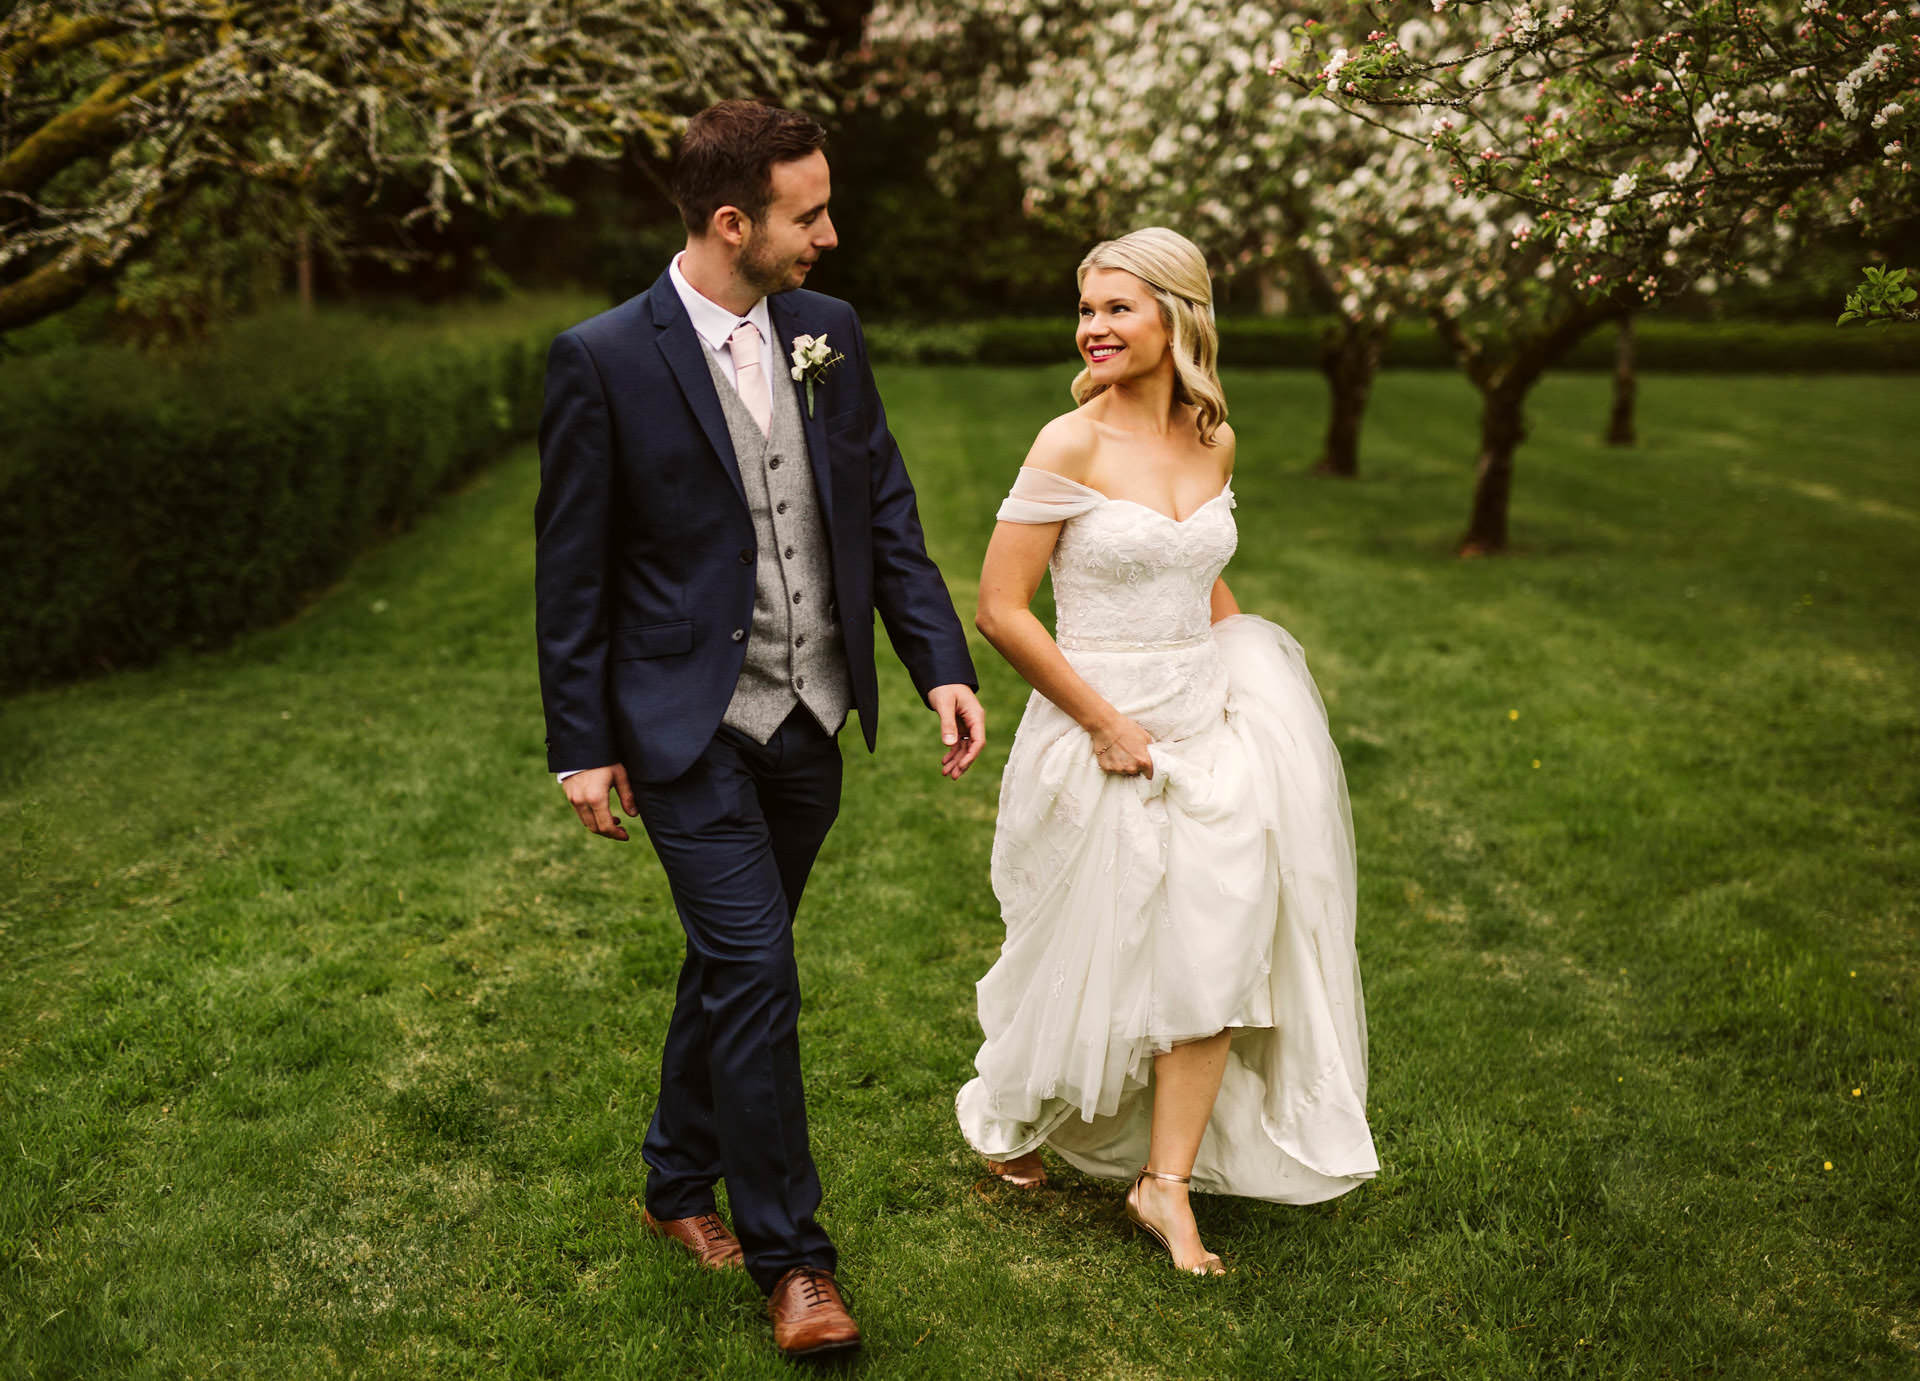 wedding-photographer-ireland-00101 17